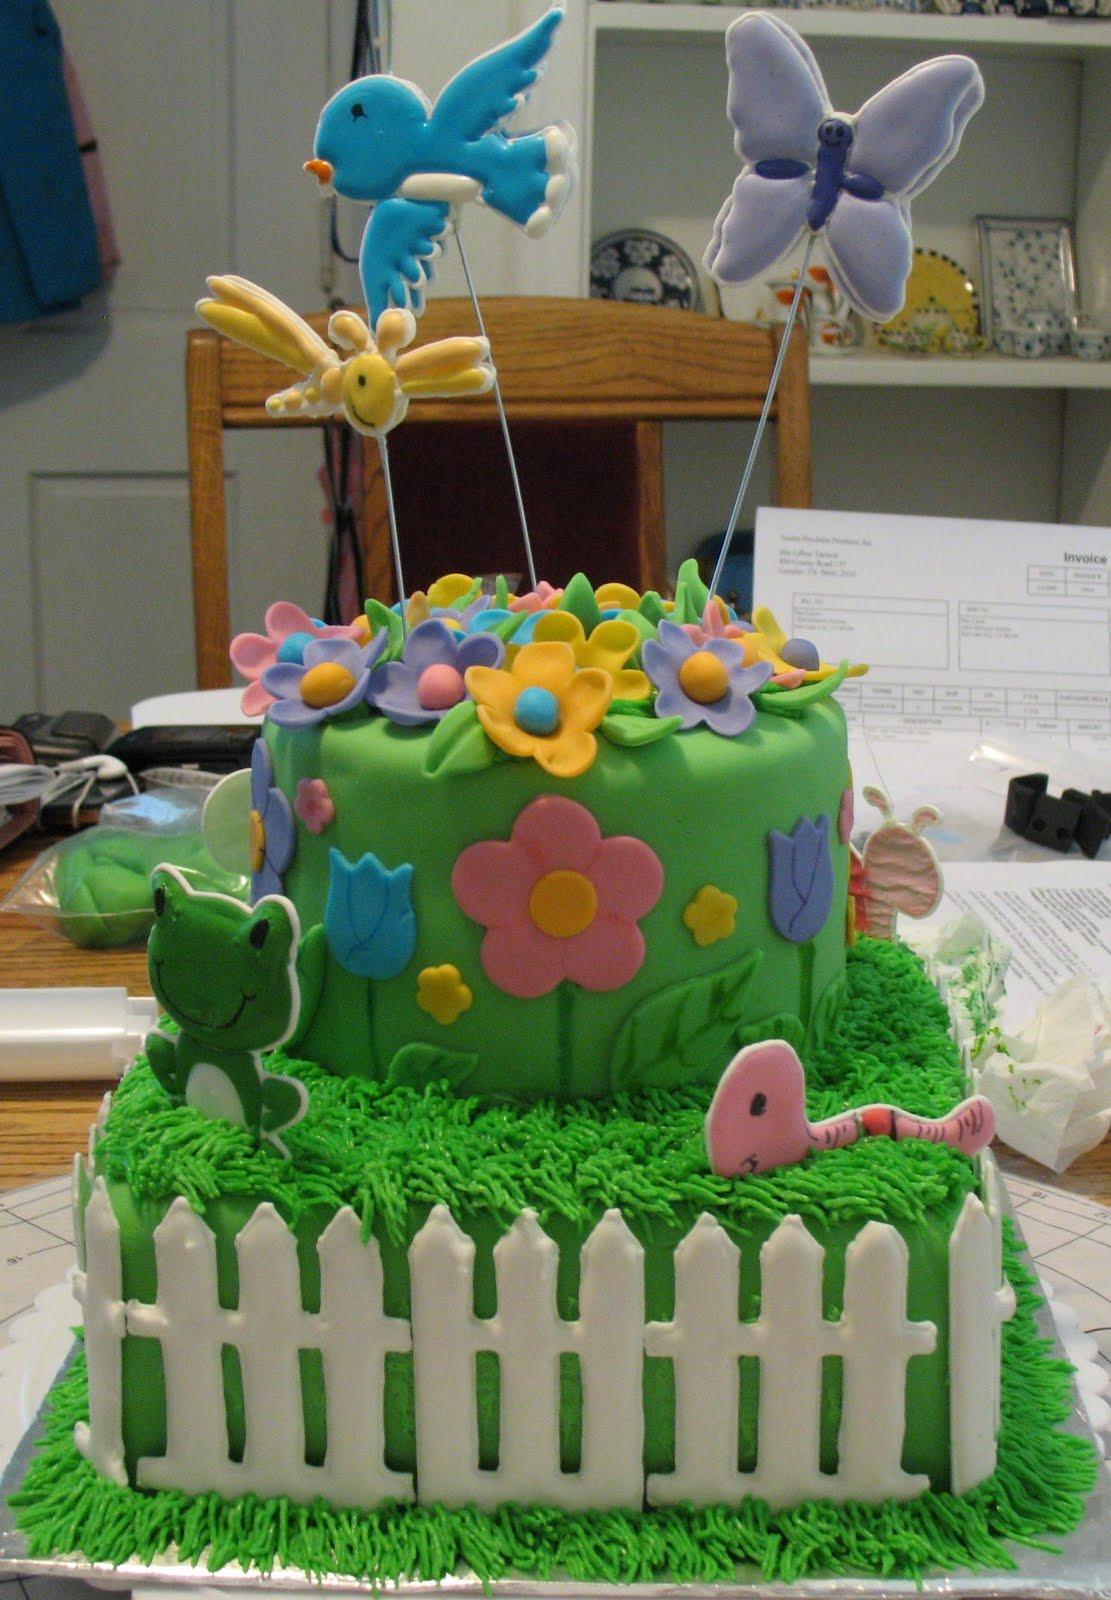 J's Cakes: The Garden Cake